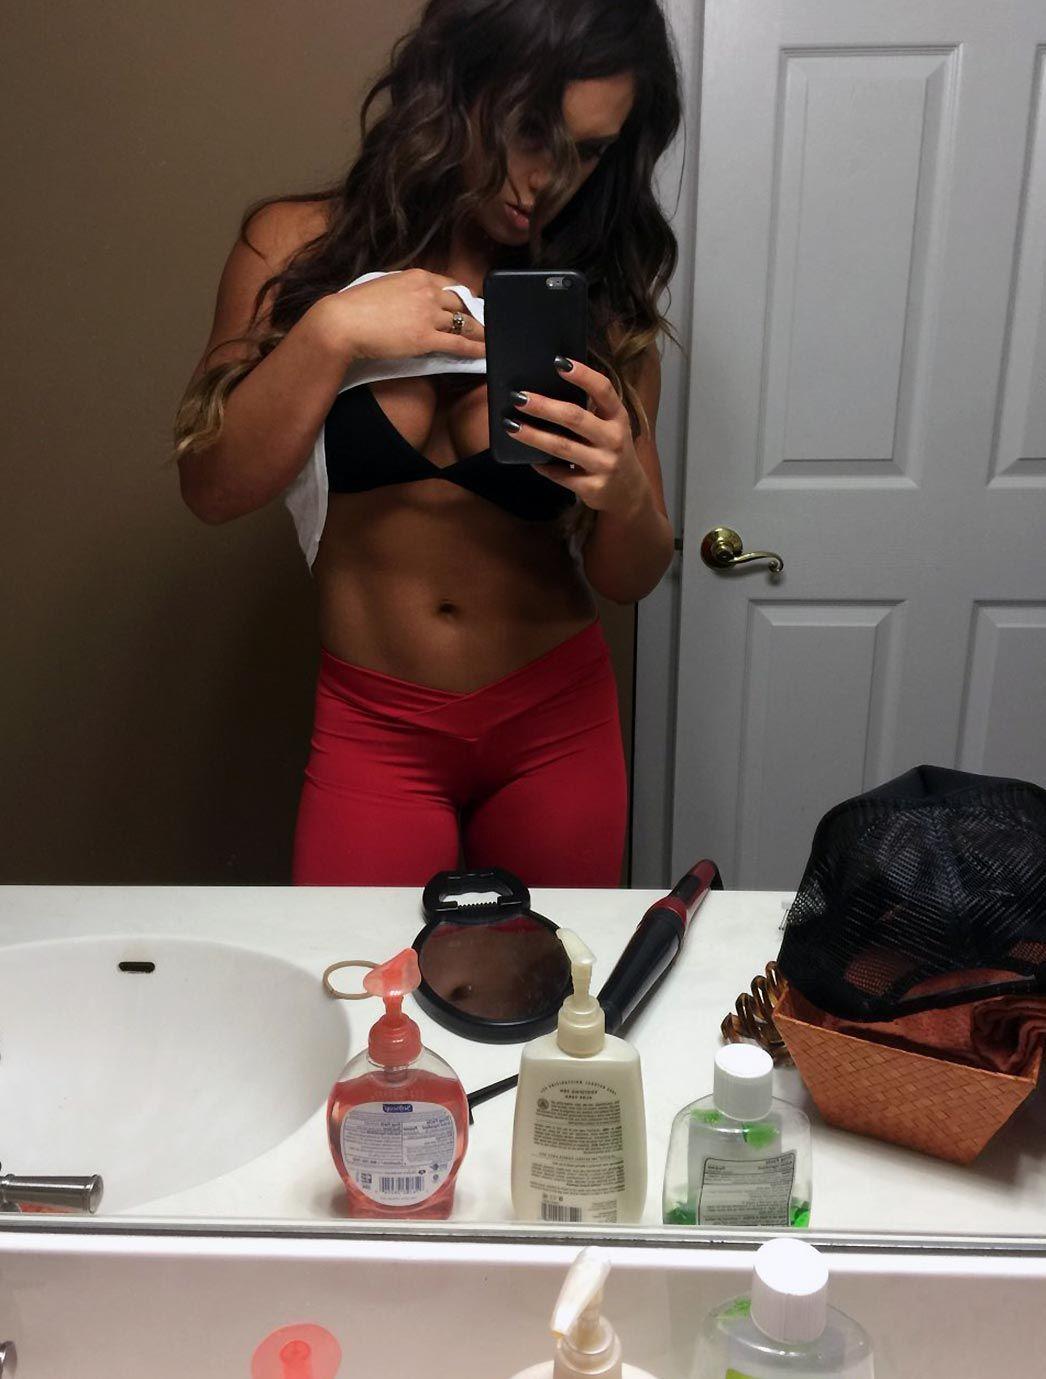 Celeste Bonin Nude Leaked The Fappening & Sexy 0289